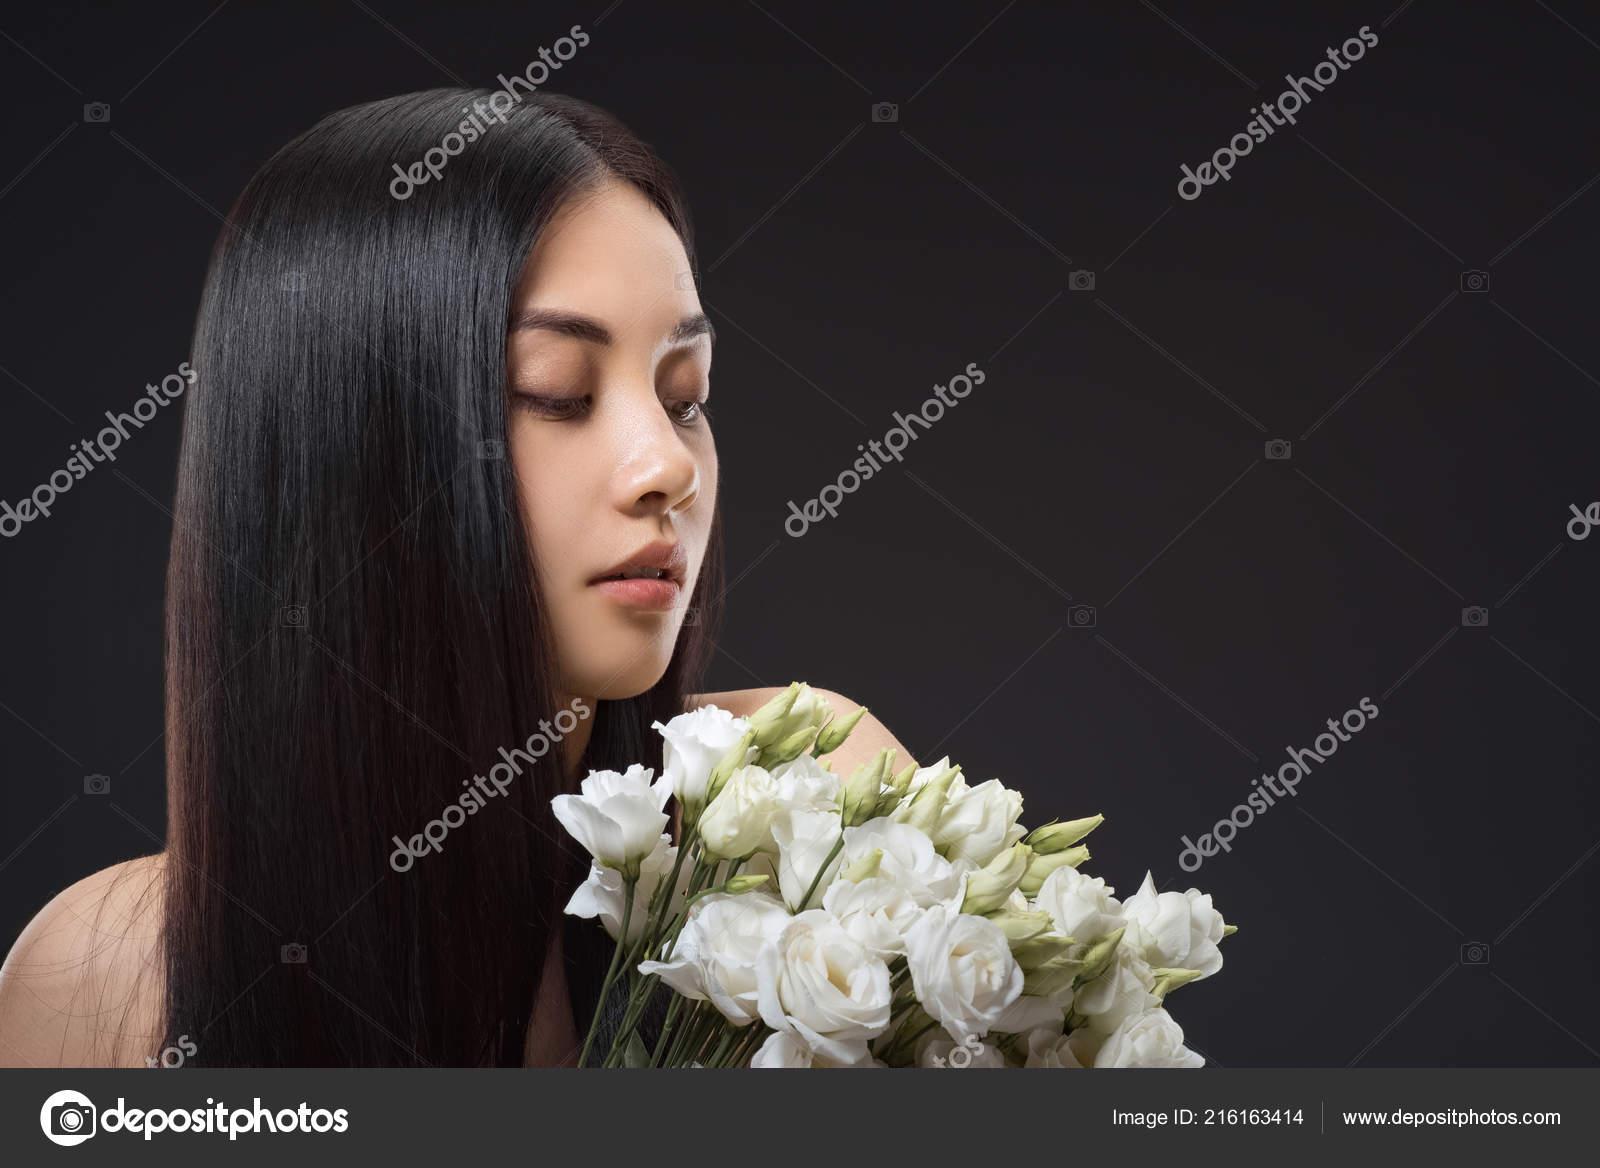 eca19372973 Portrét asijské ženy krásné tmavé vlasy a kytice bílá eustoma izolované na  černém pozadí– stock obrázky